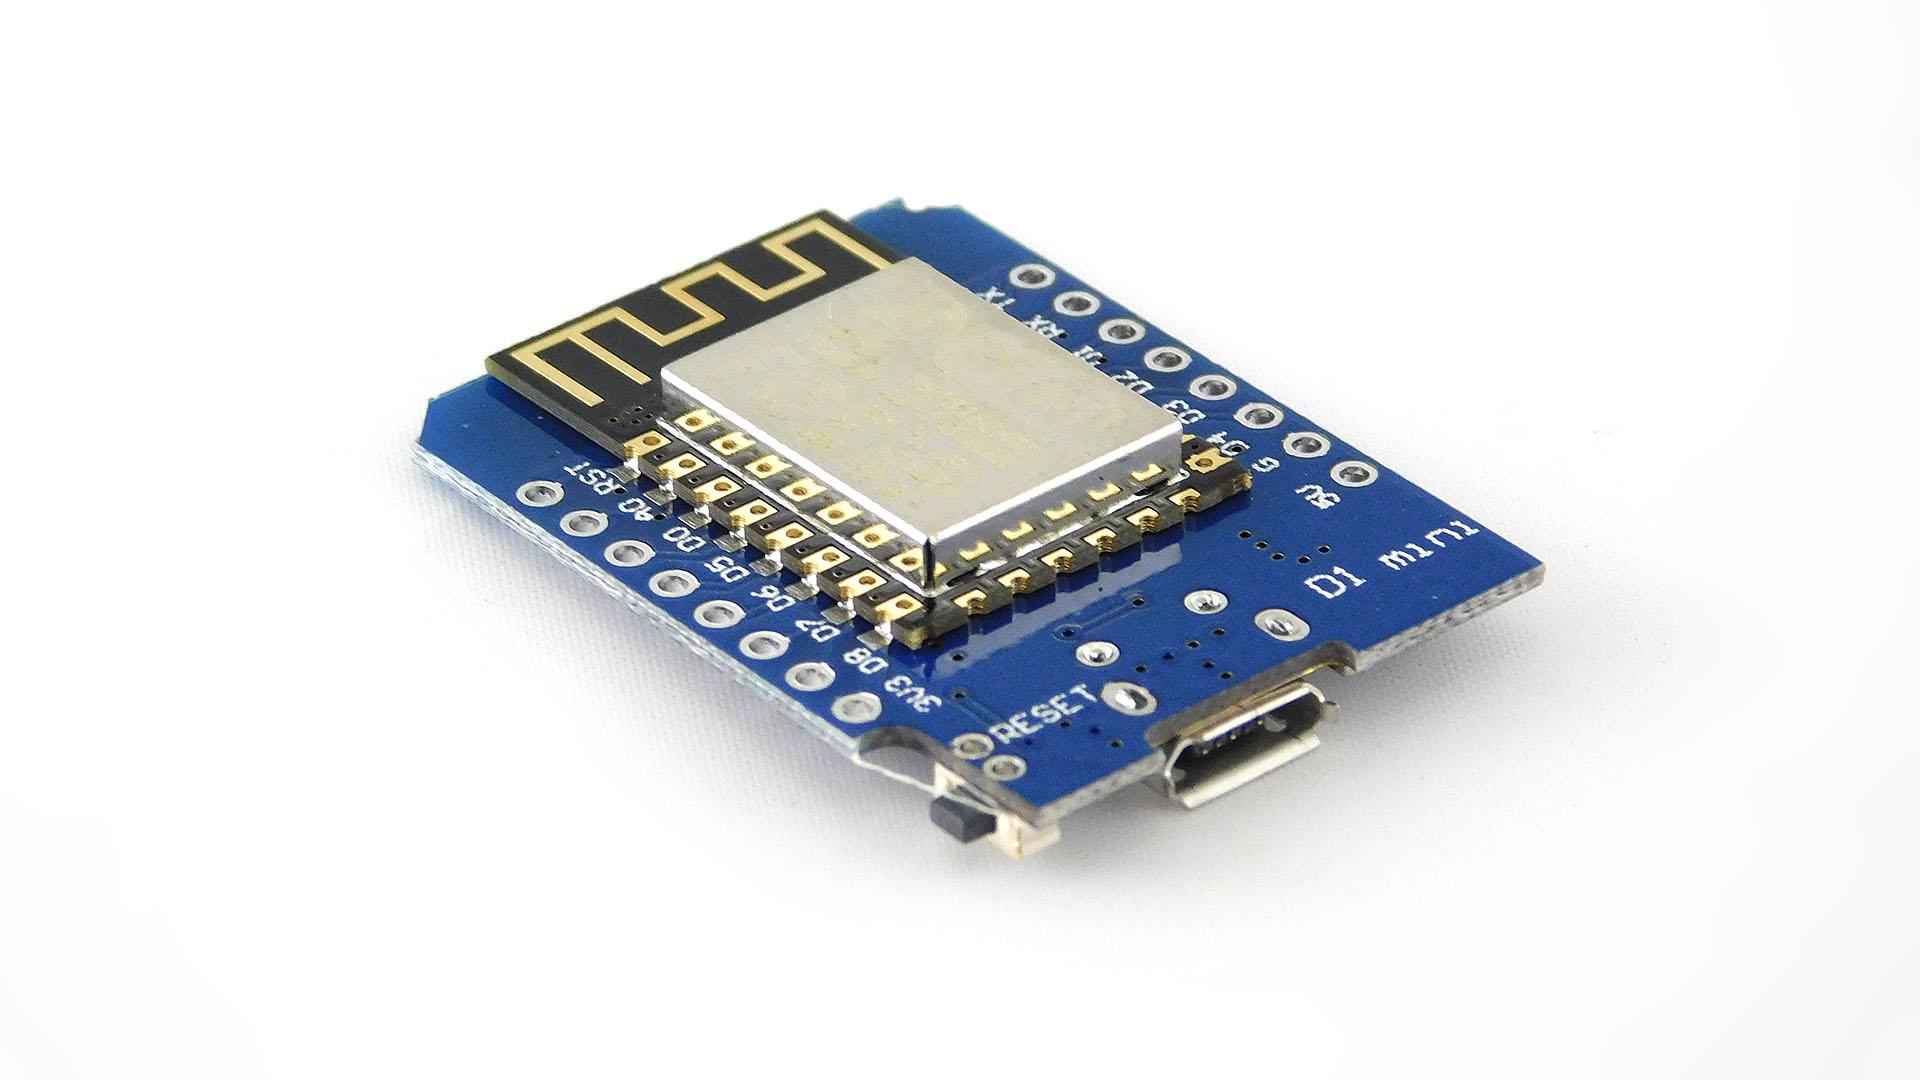 b89e348b9857e Nettigo: Wemos D1 mini V2 WiFi module